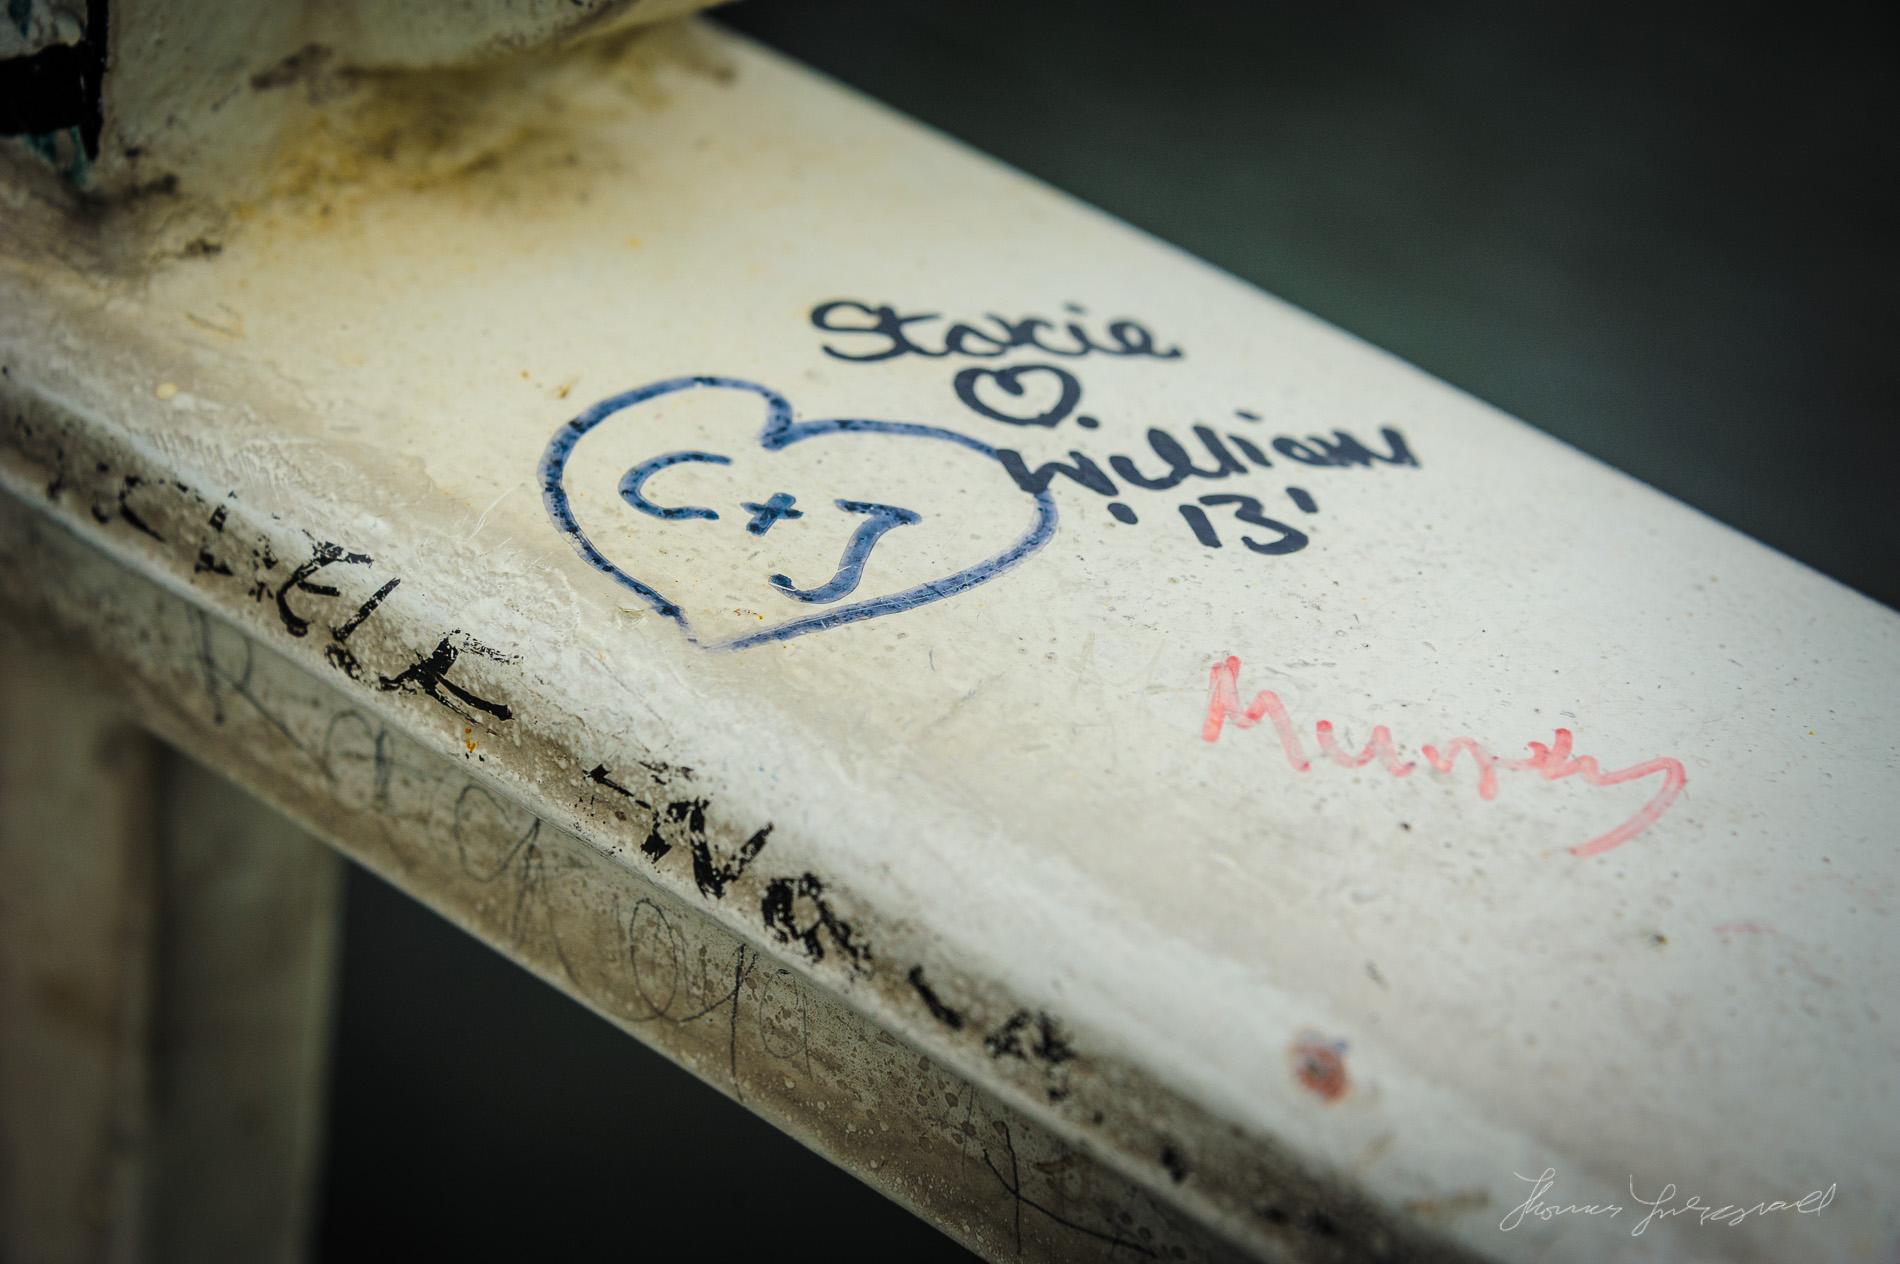 Writing on the bridge